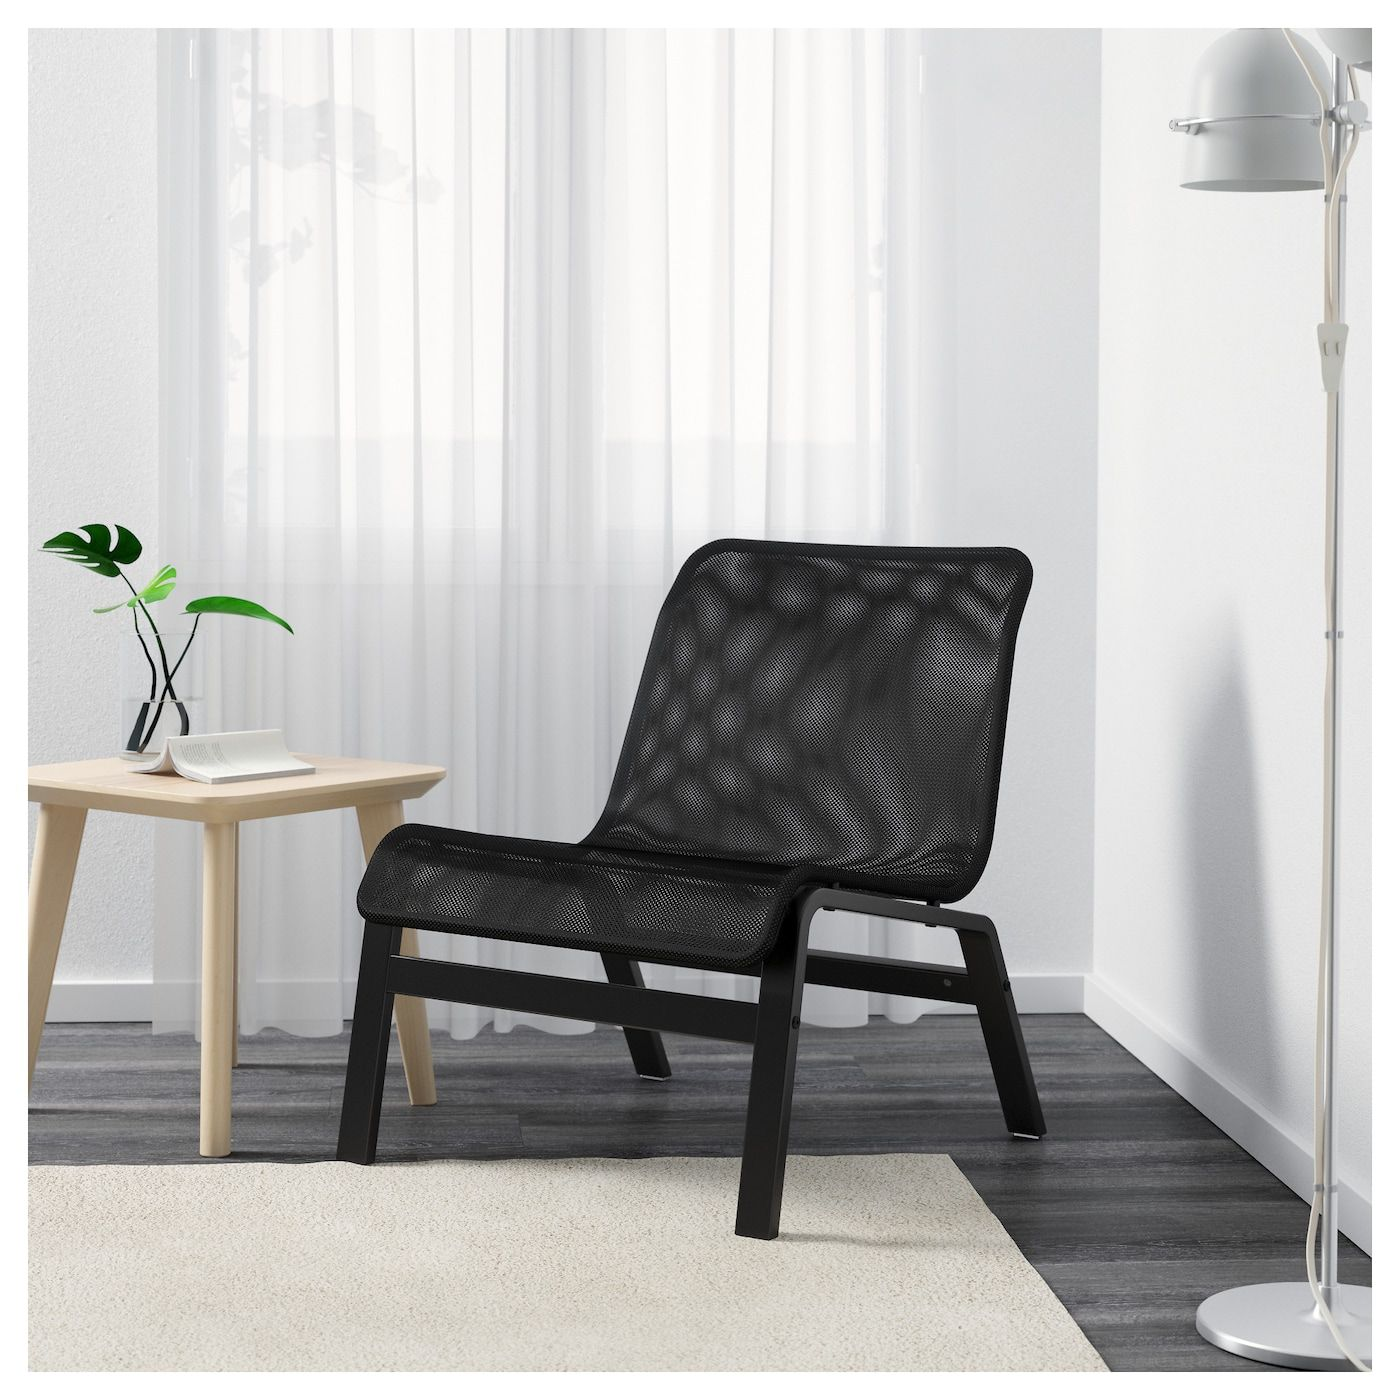 Nolmyra Fatolj Svart Svart Ikea Scandinavian Furniture Design Accent Chairs For Living Room Black Lounge Chair